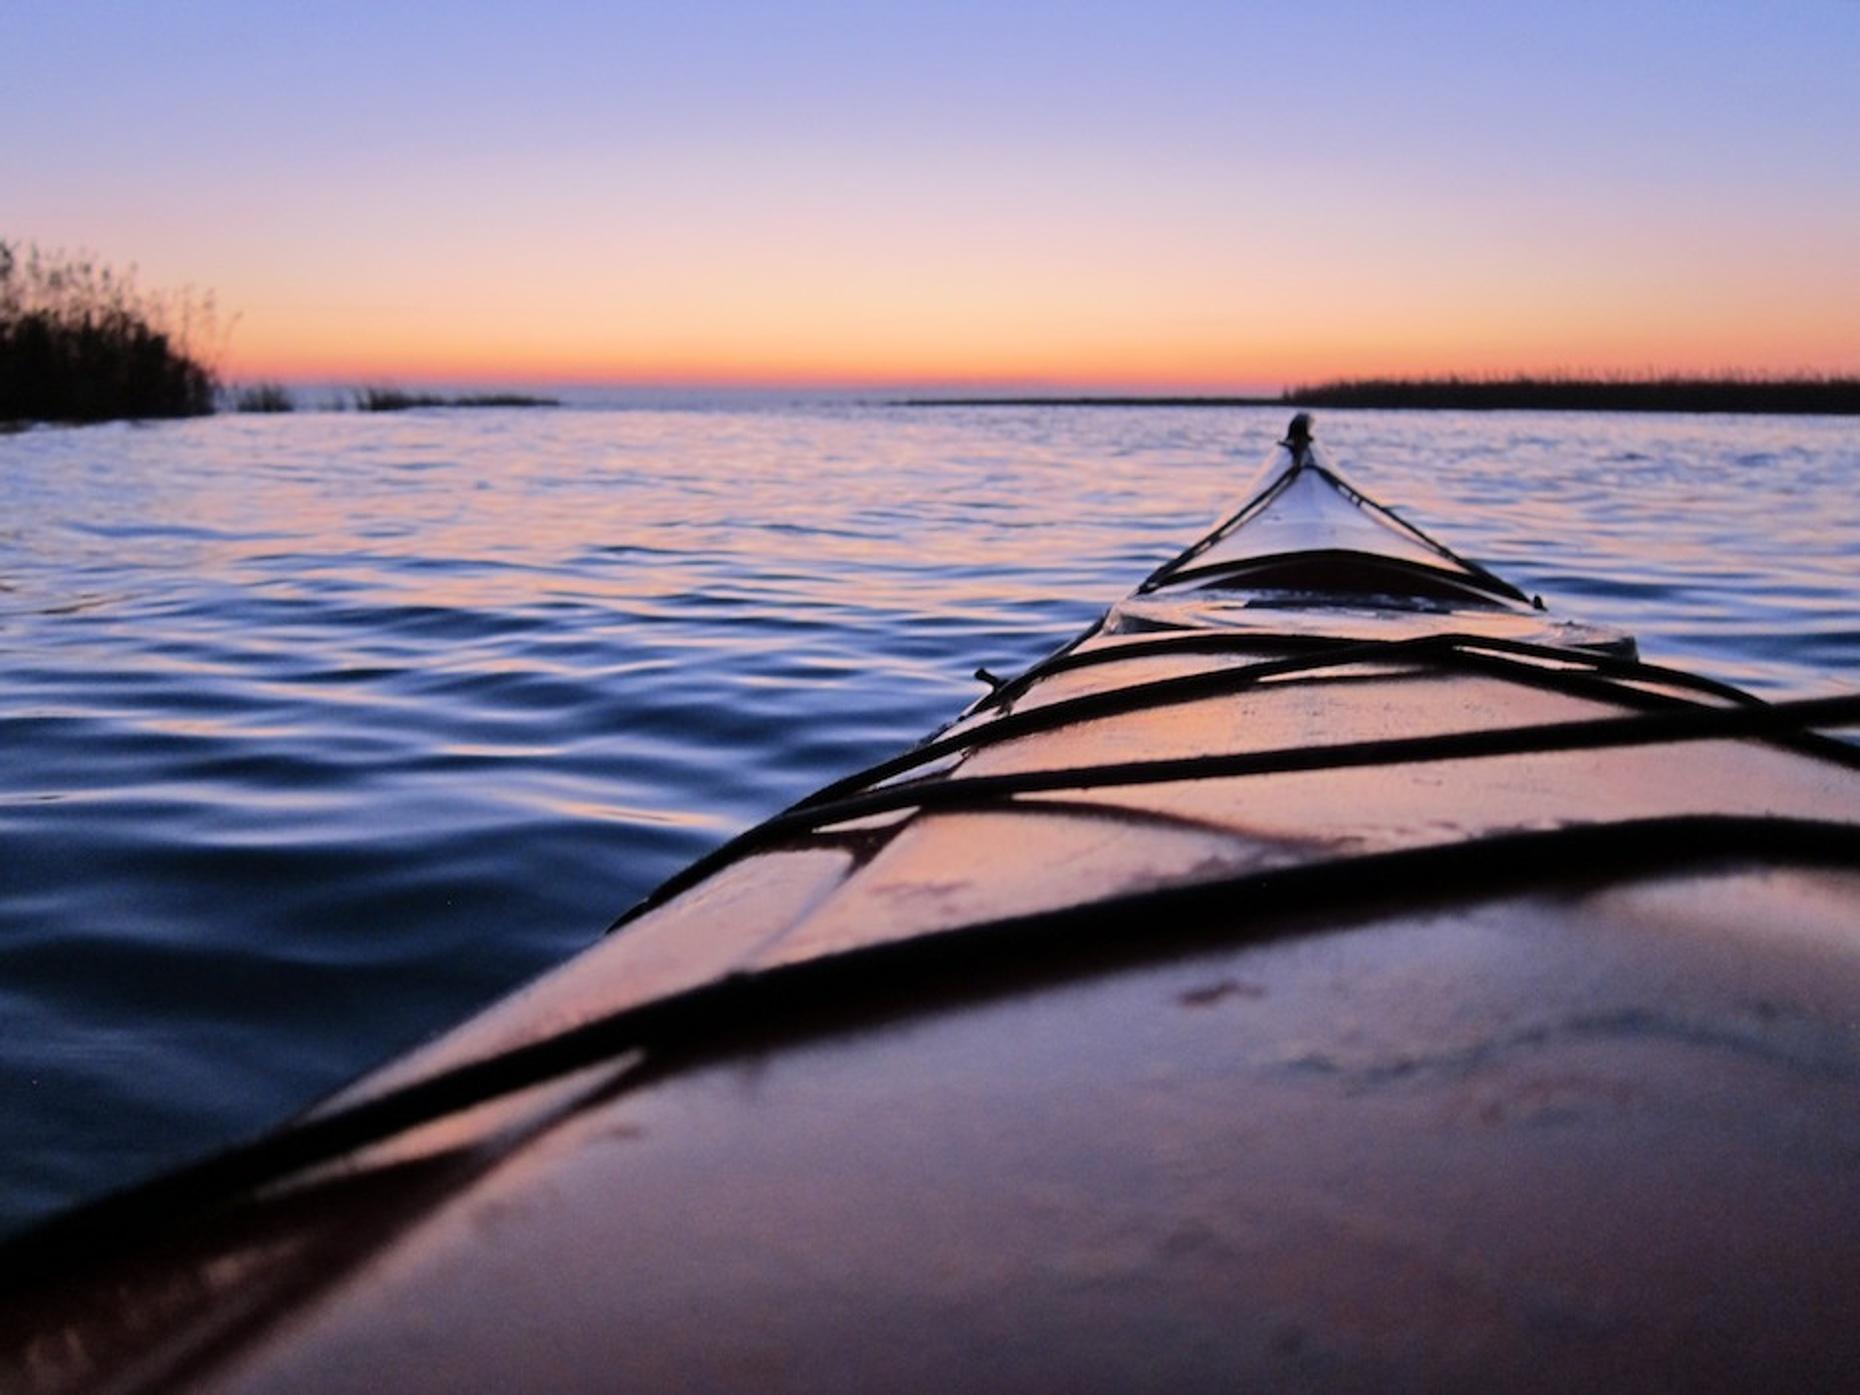 Merritt Island Bioluminescence Kayak Tour